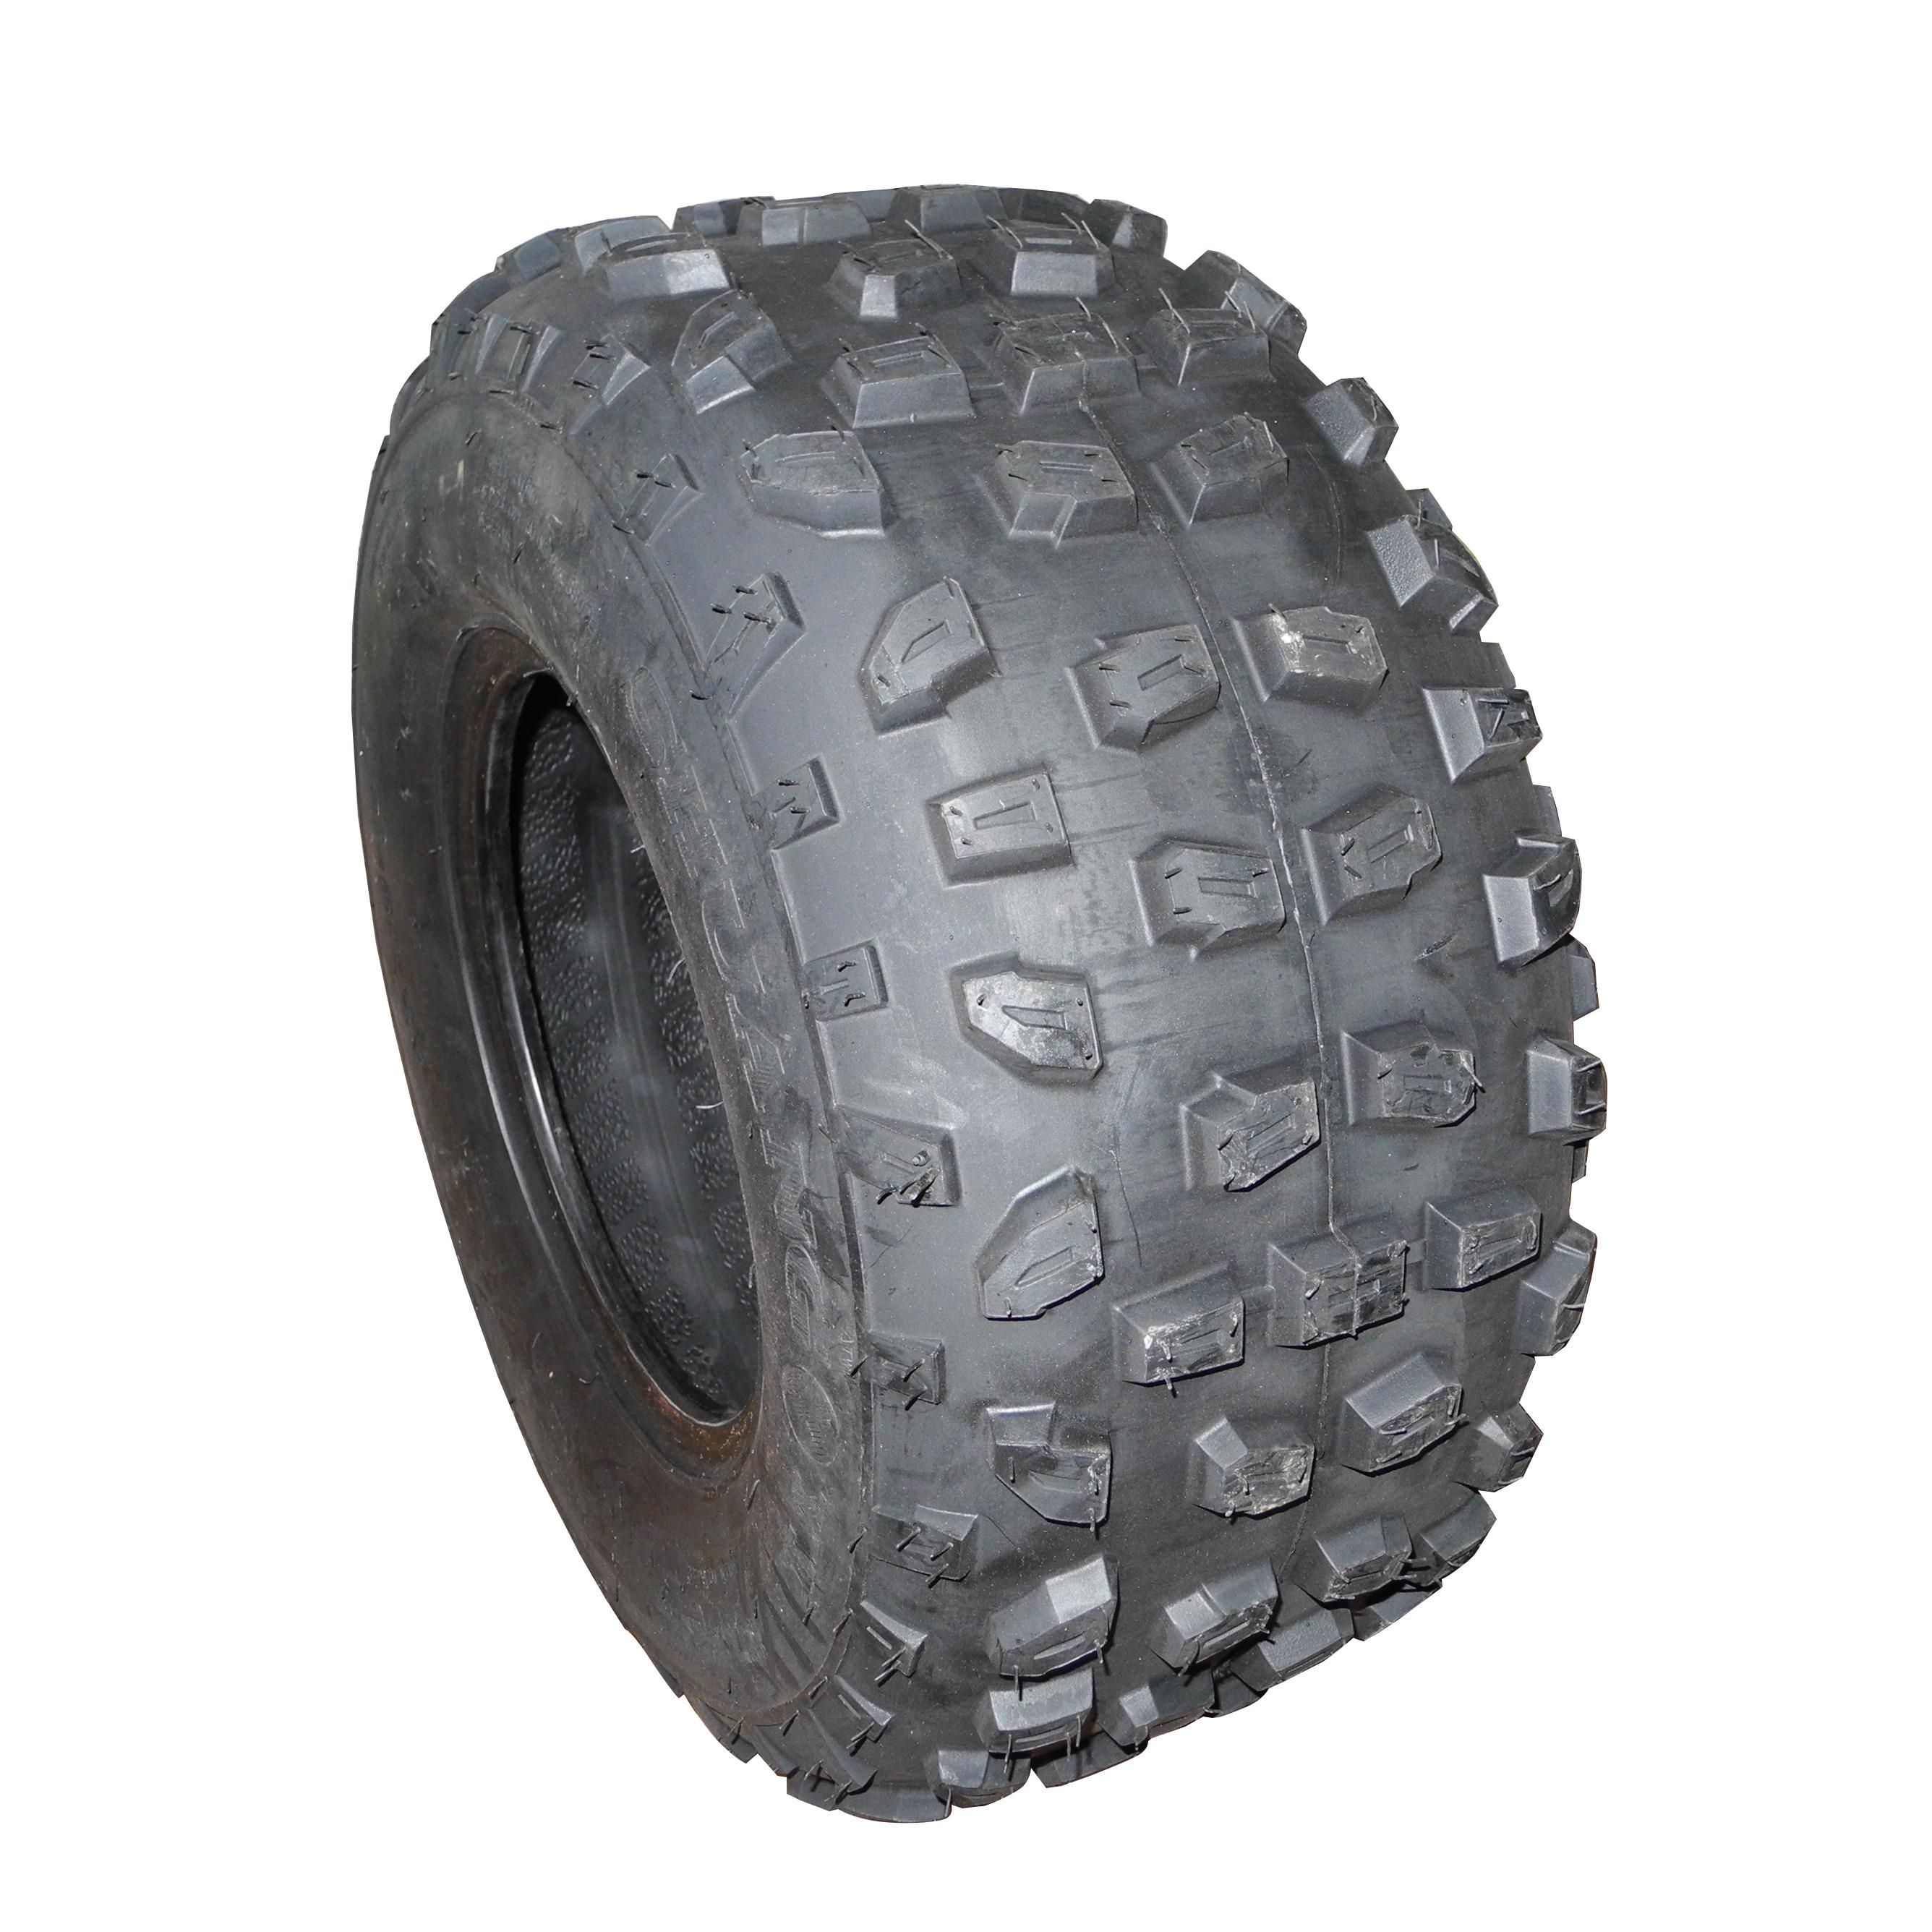 Atv,rv,boat & Other Vehicle Go Kart Parts & Accessories Go Kart Karting Atv Utv Buggy 16x8-7 Inch Wheel Tubeless Tyre Tire With Hub